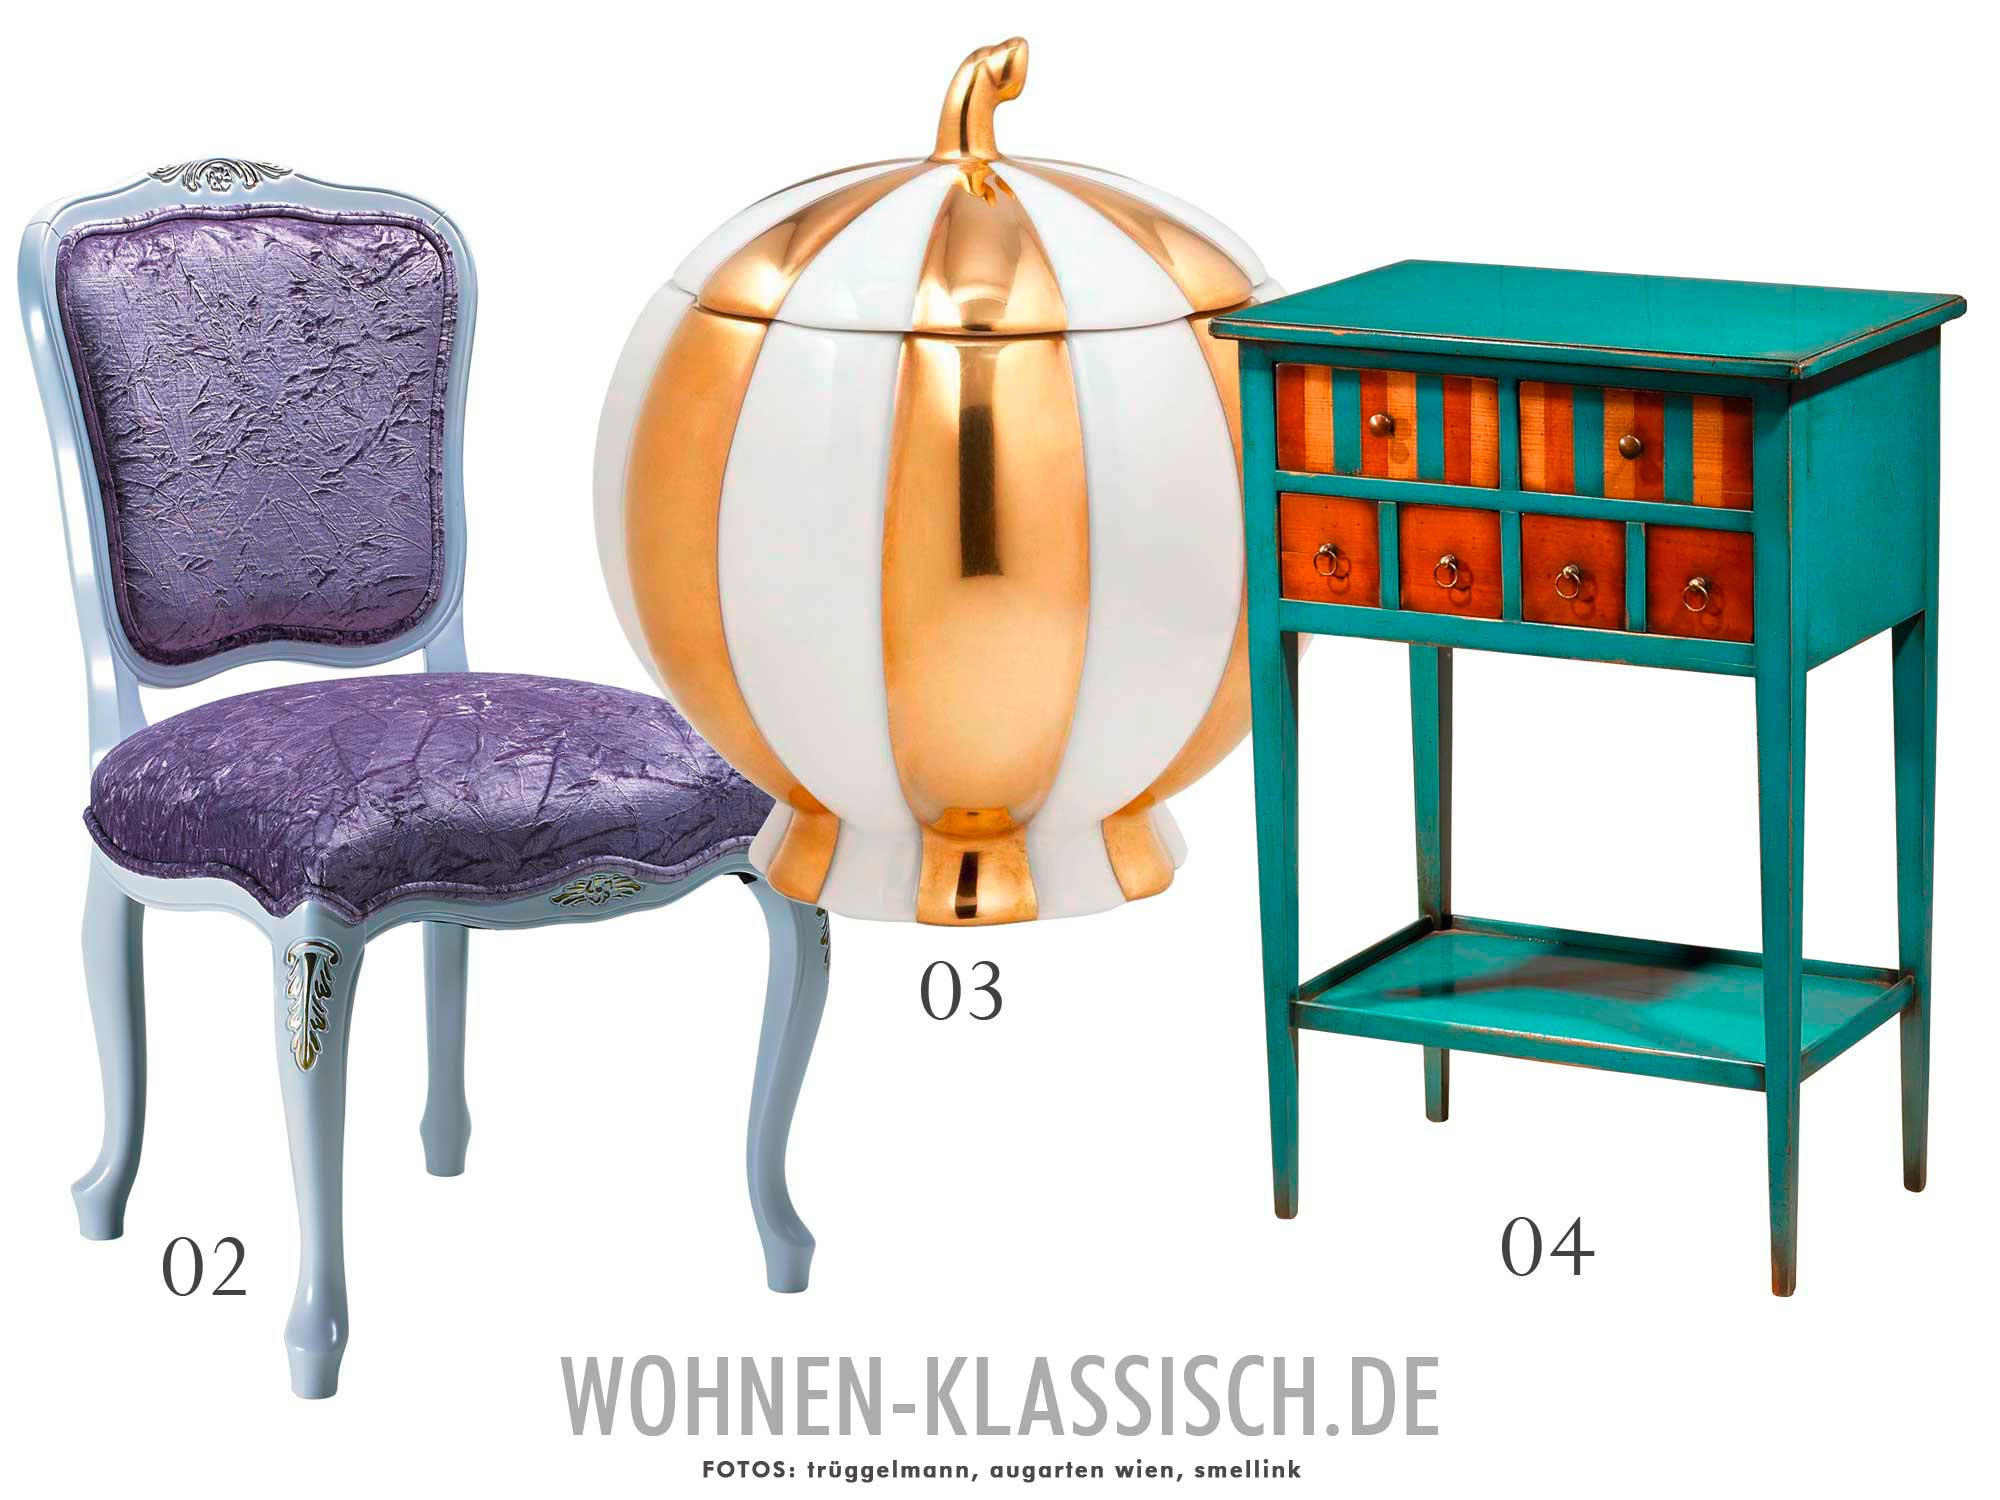 Top Ten: Bunte klassische Möbel und Accessoires | KLASSISCH WOHNEN